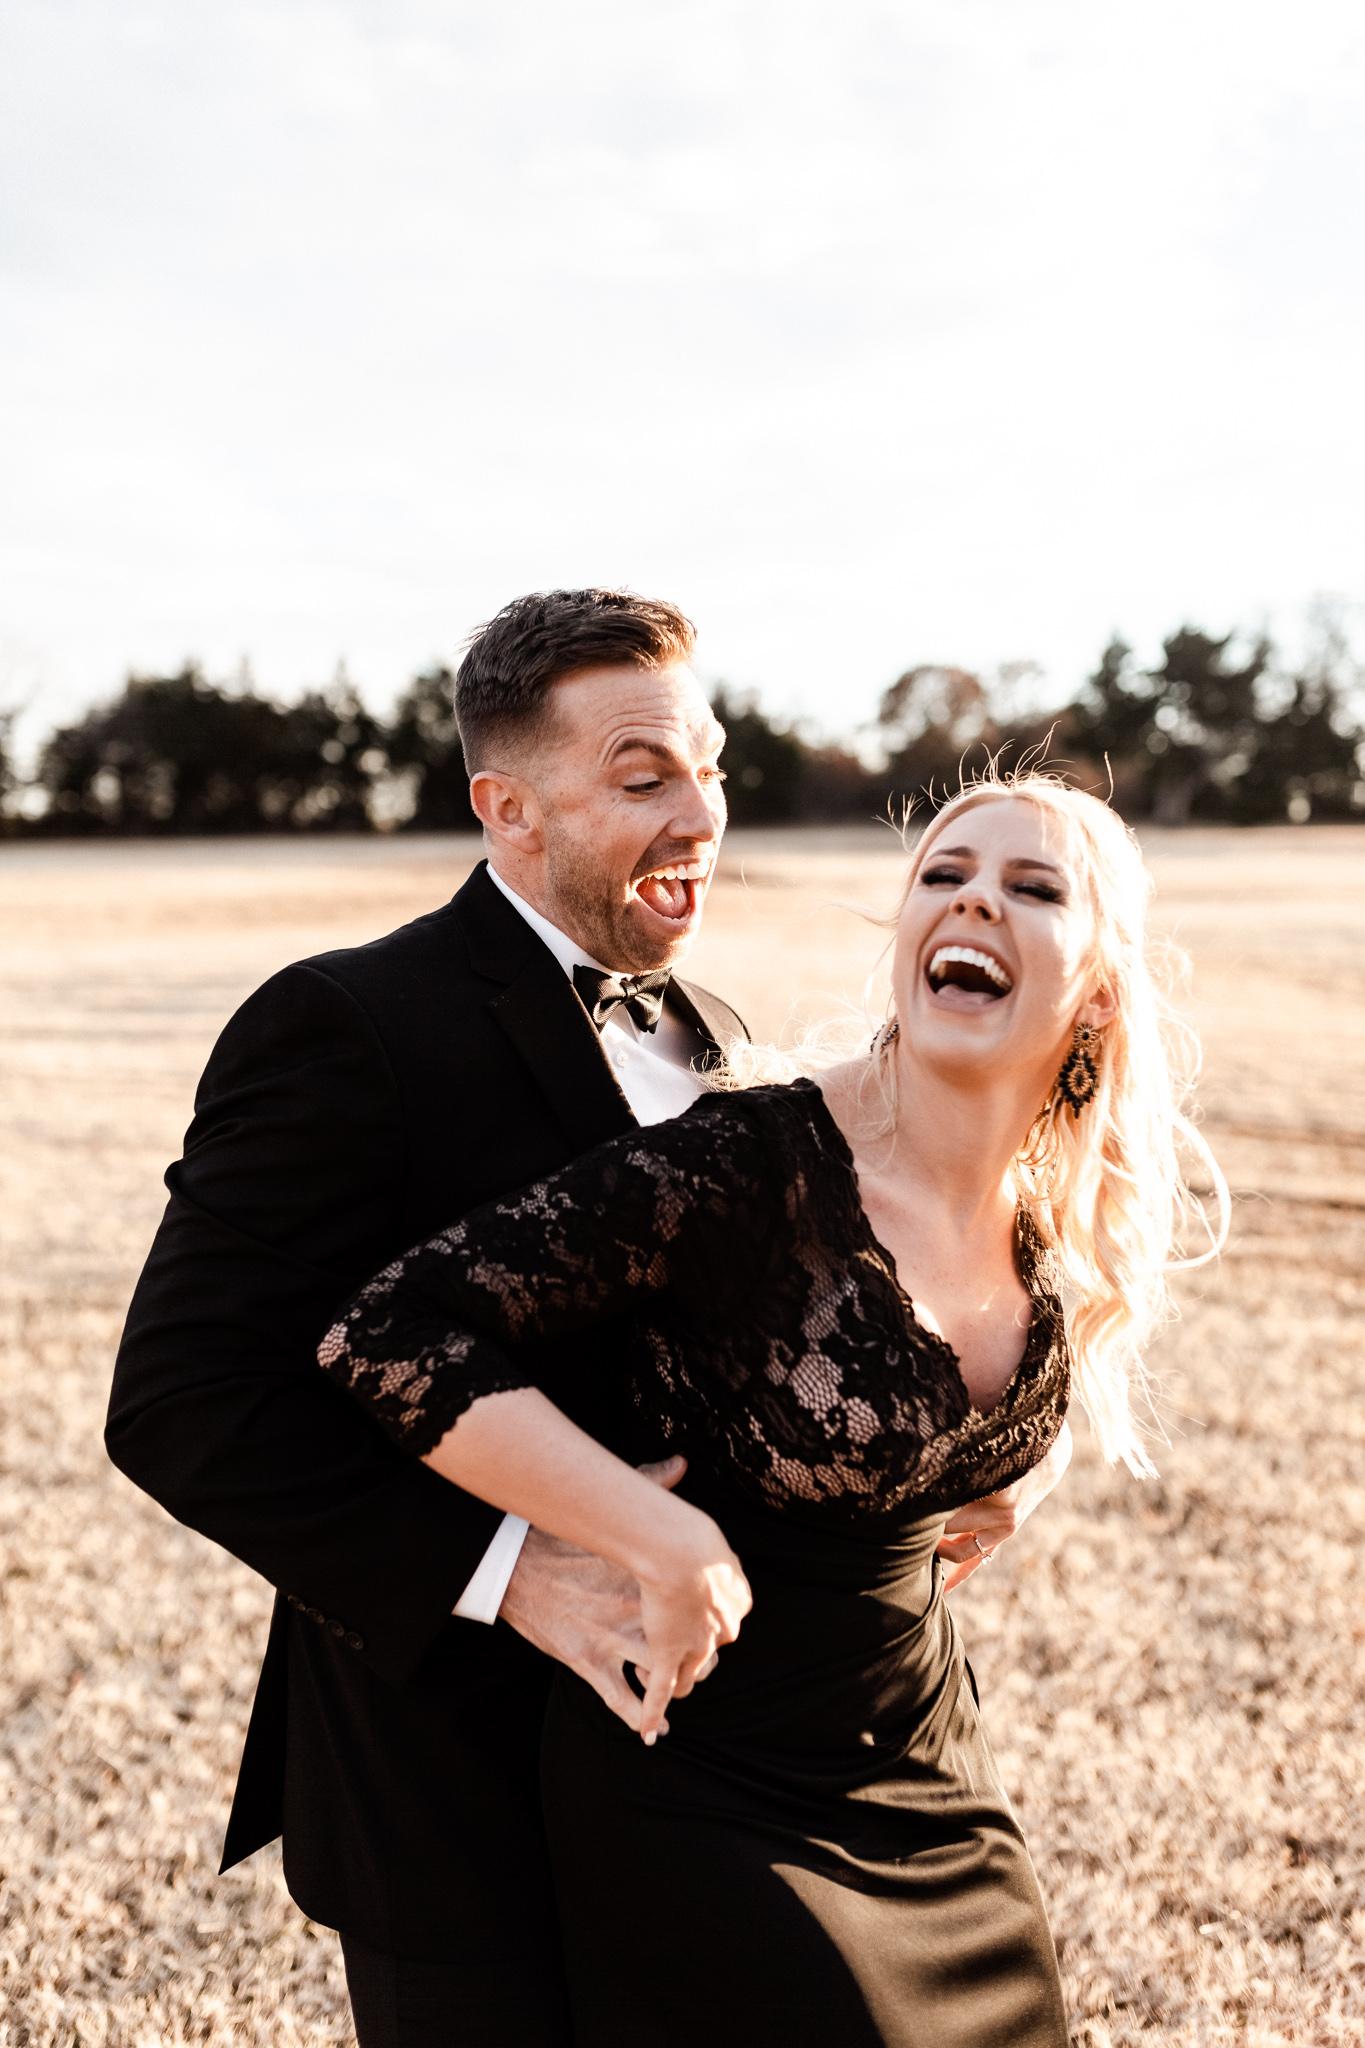 Wade + Stephanie | Warm Open Field Engagements | Oklahoma Wedding Photographer-44.jpg